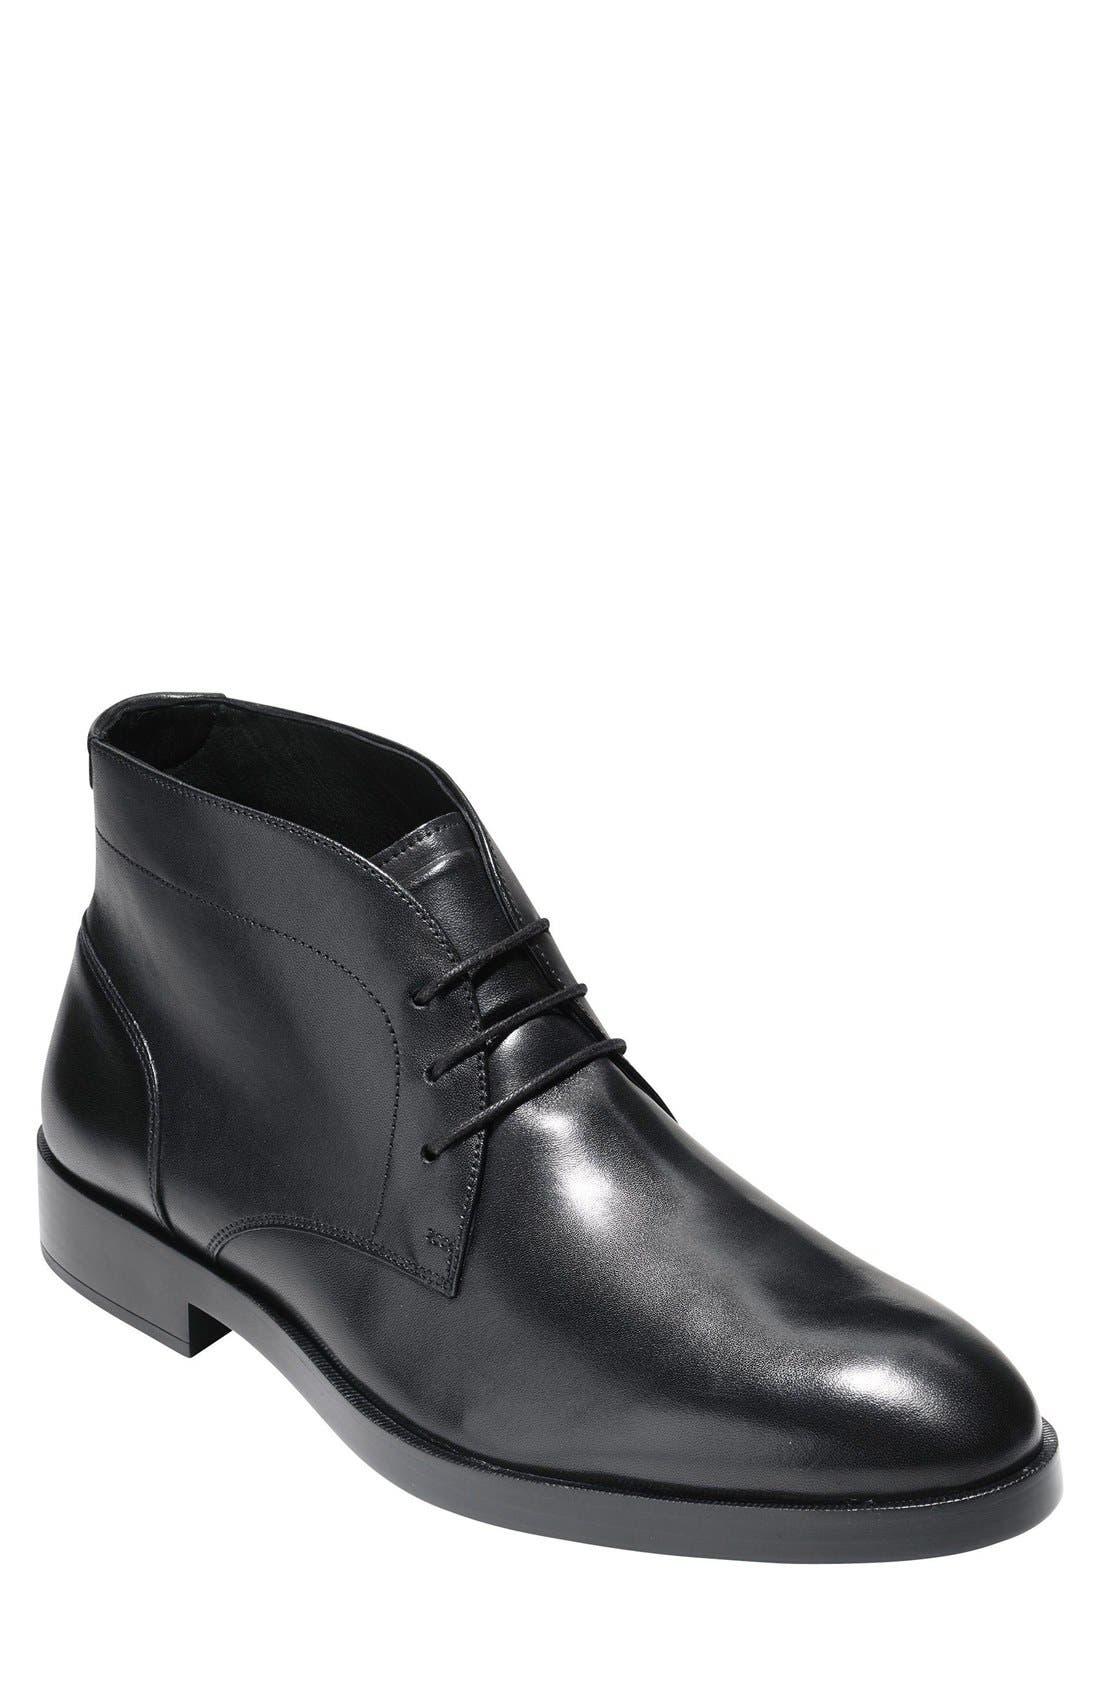 Harrison Grand Chukka Boot,                         Main,                         color, 001